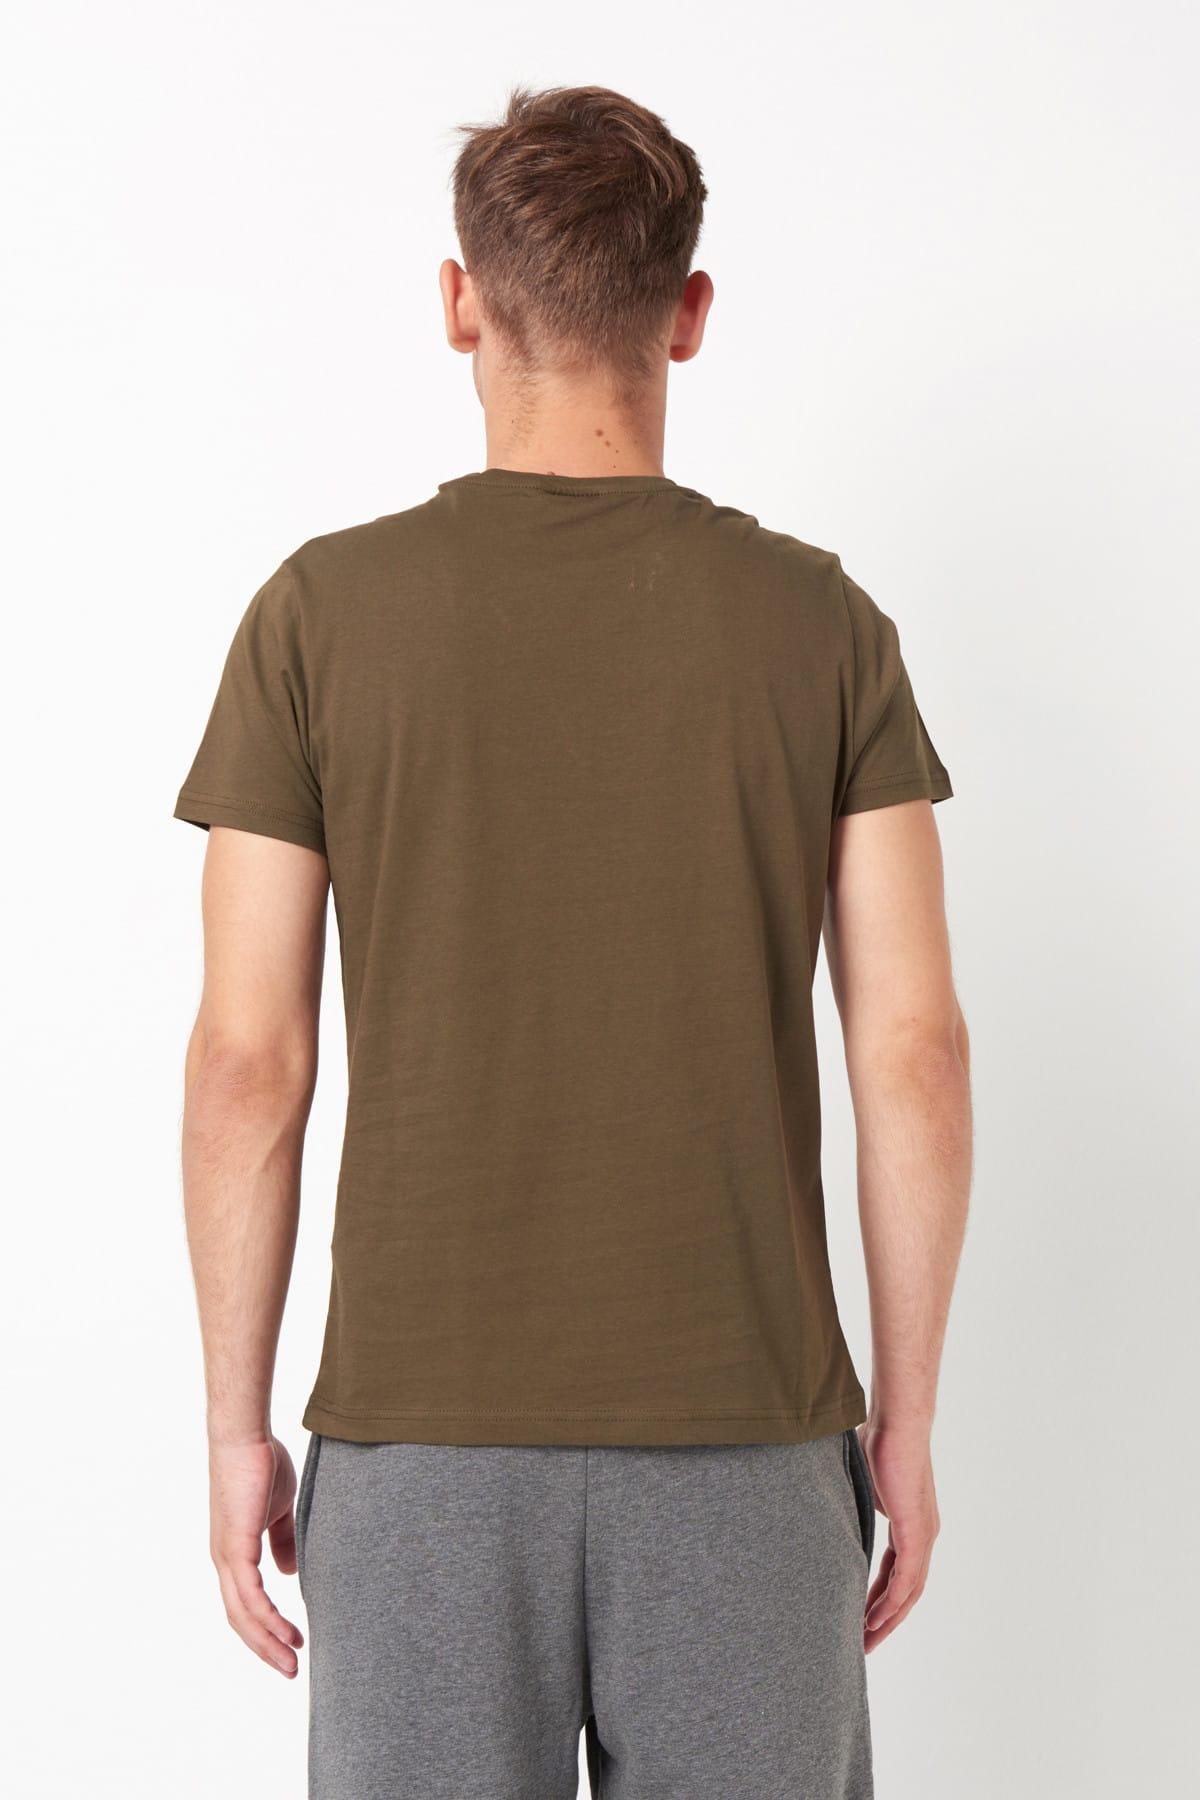 HUMMEL HMLENZO  T-SHIRT S/S TEE Koyu Haki Erkek T-Shirt 100579829 2